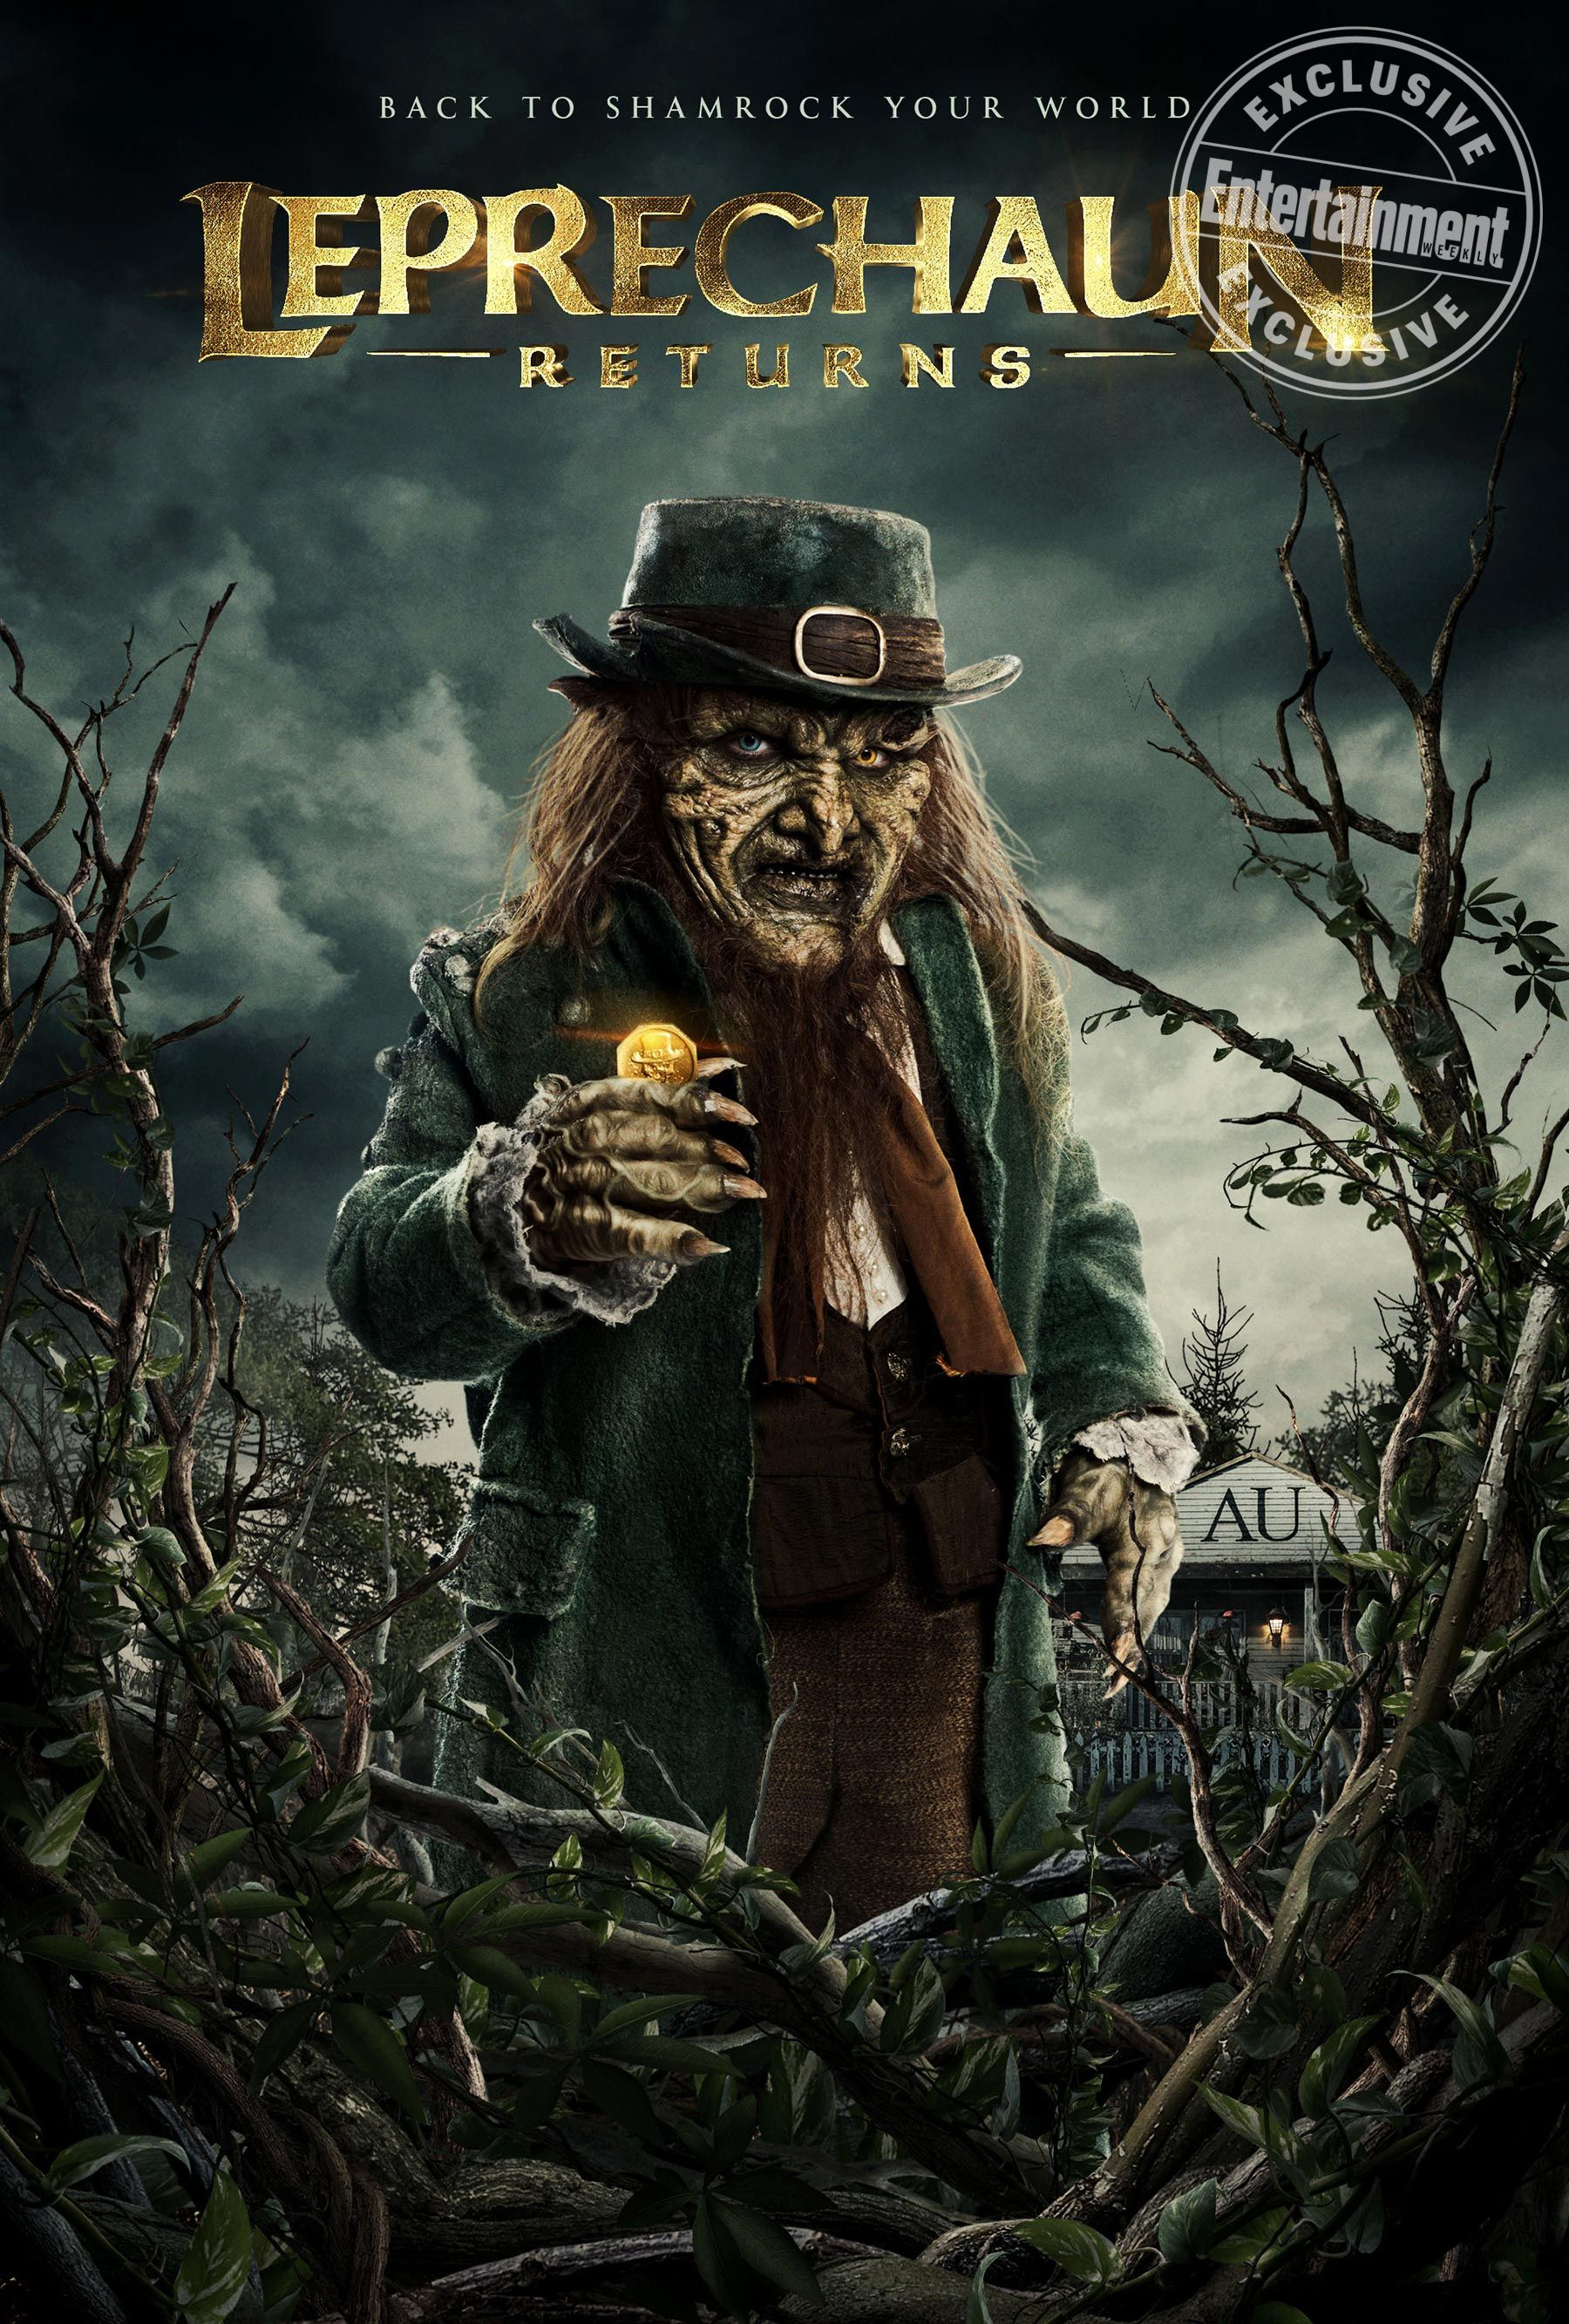 Em Leprechaun Returns Em Trailer Teases Magic Mayhem And Lots Of Gore Leprechaun Movie Leprechaun Movies